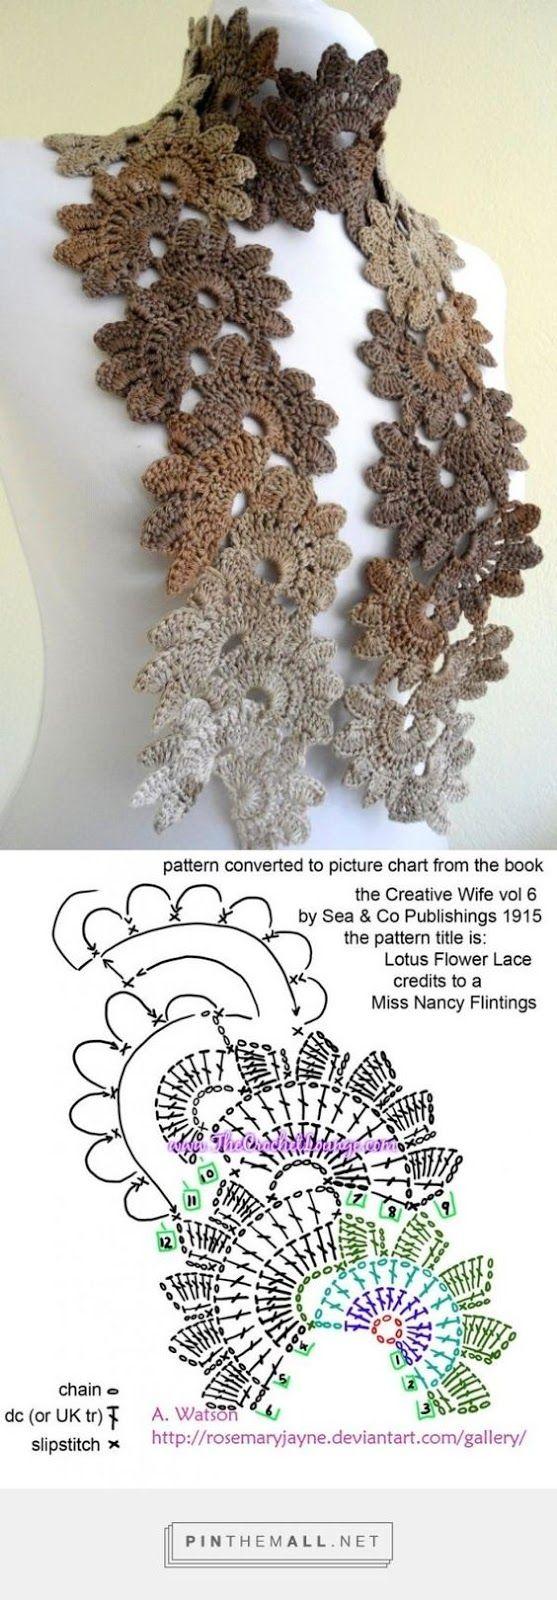 Pin de Rosa Emilia en Patrones de ganchillo | Pinterest | Ganchillo ...